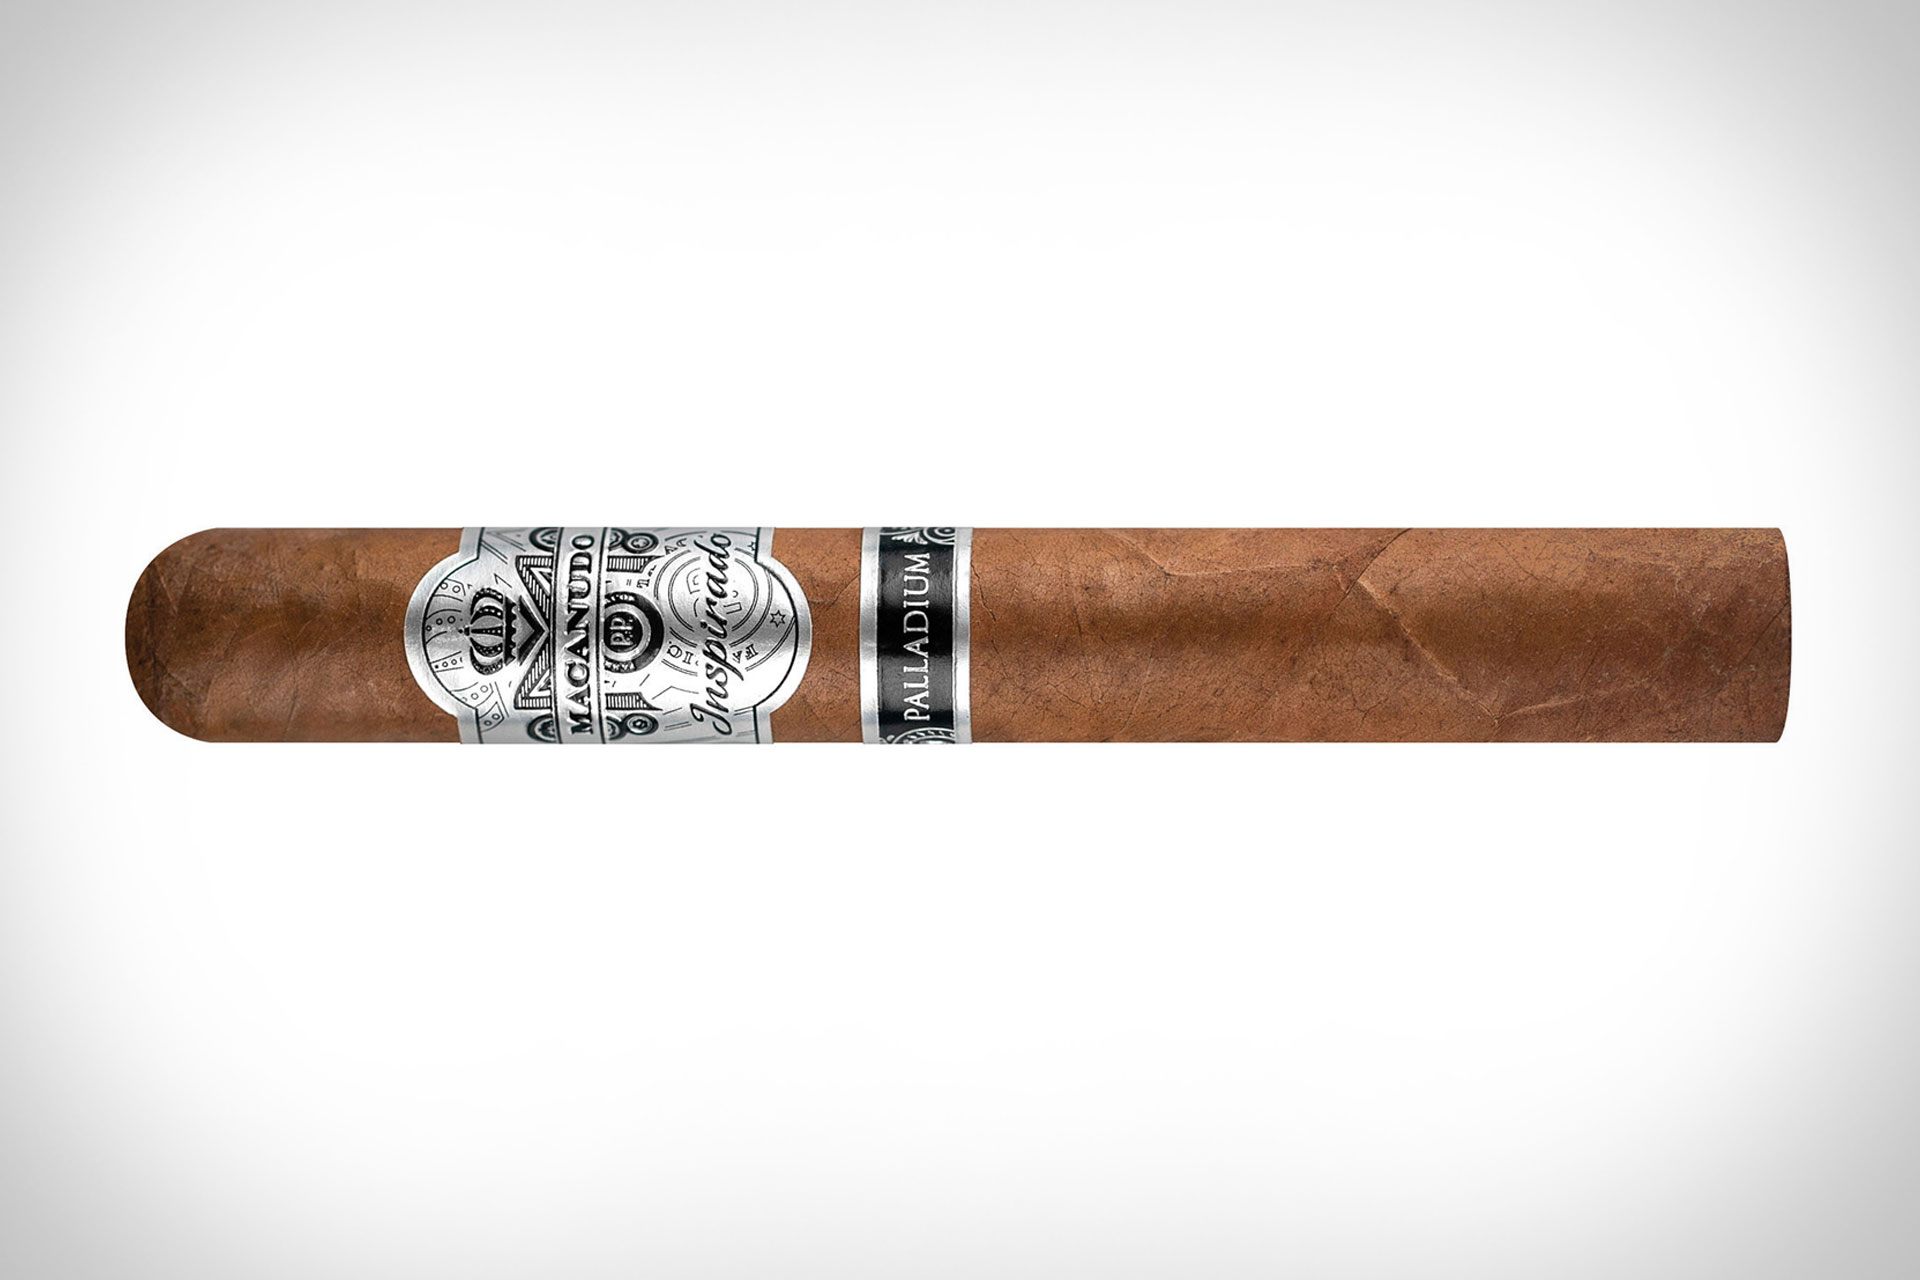 Macanudo Inspirado Palladium Cigar